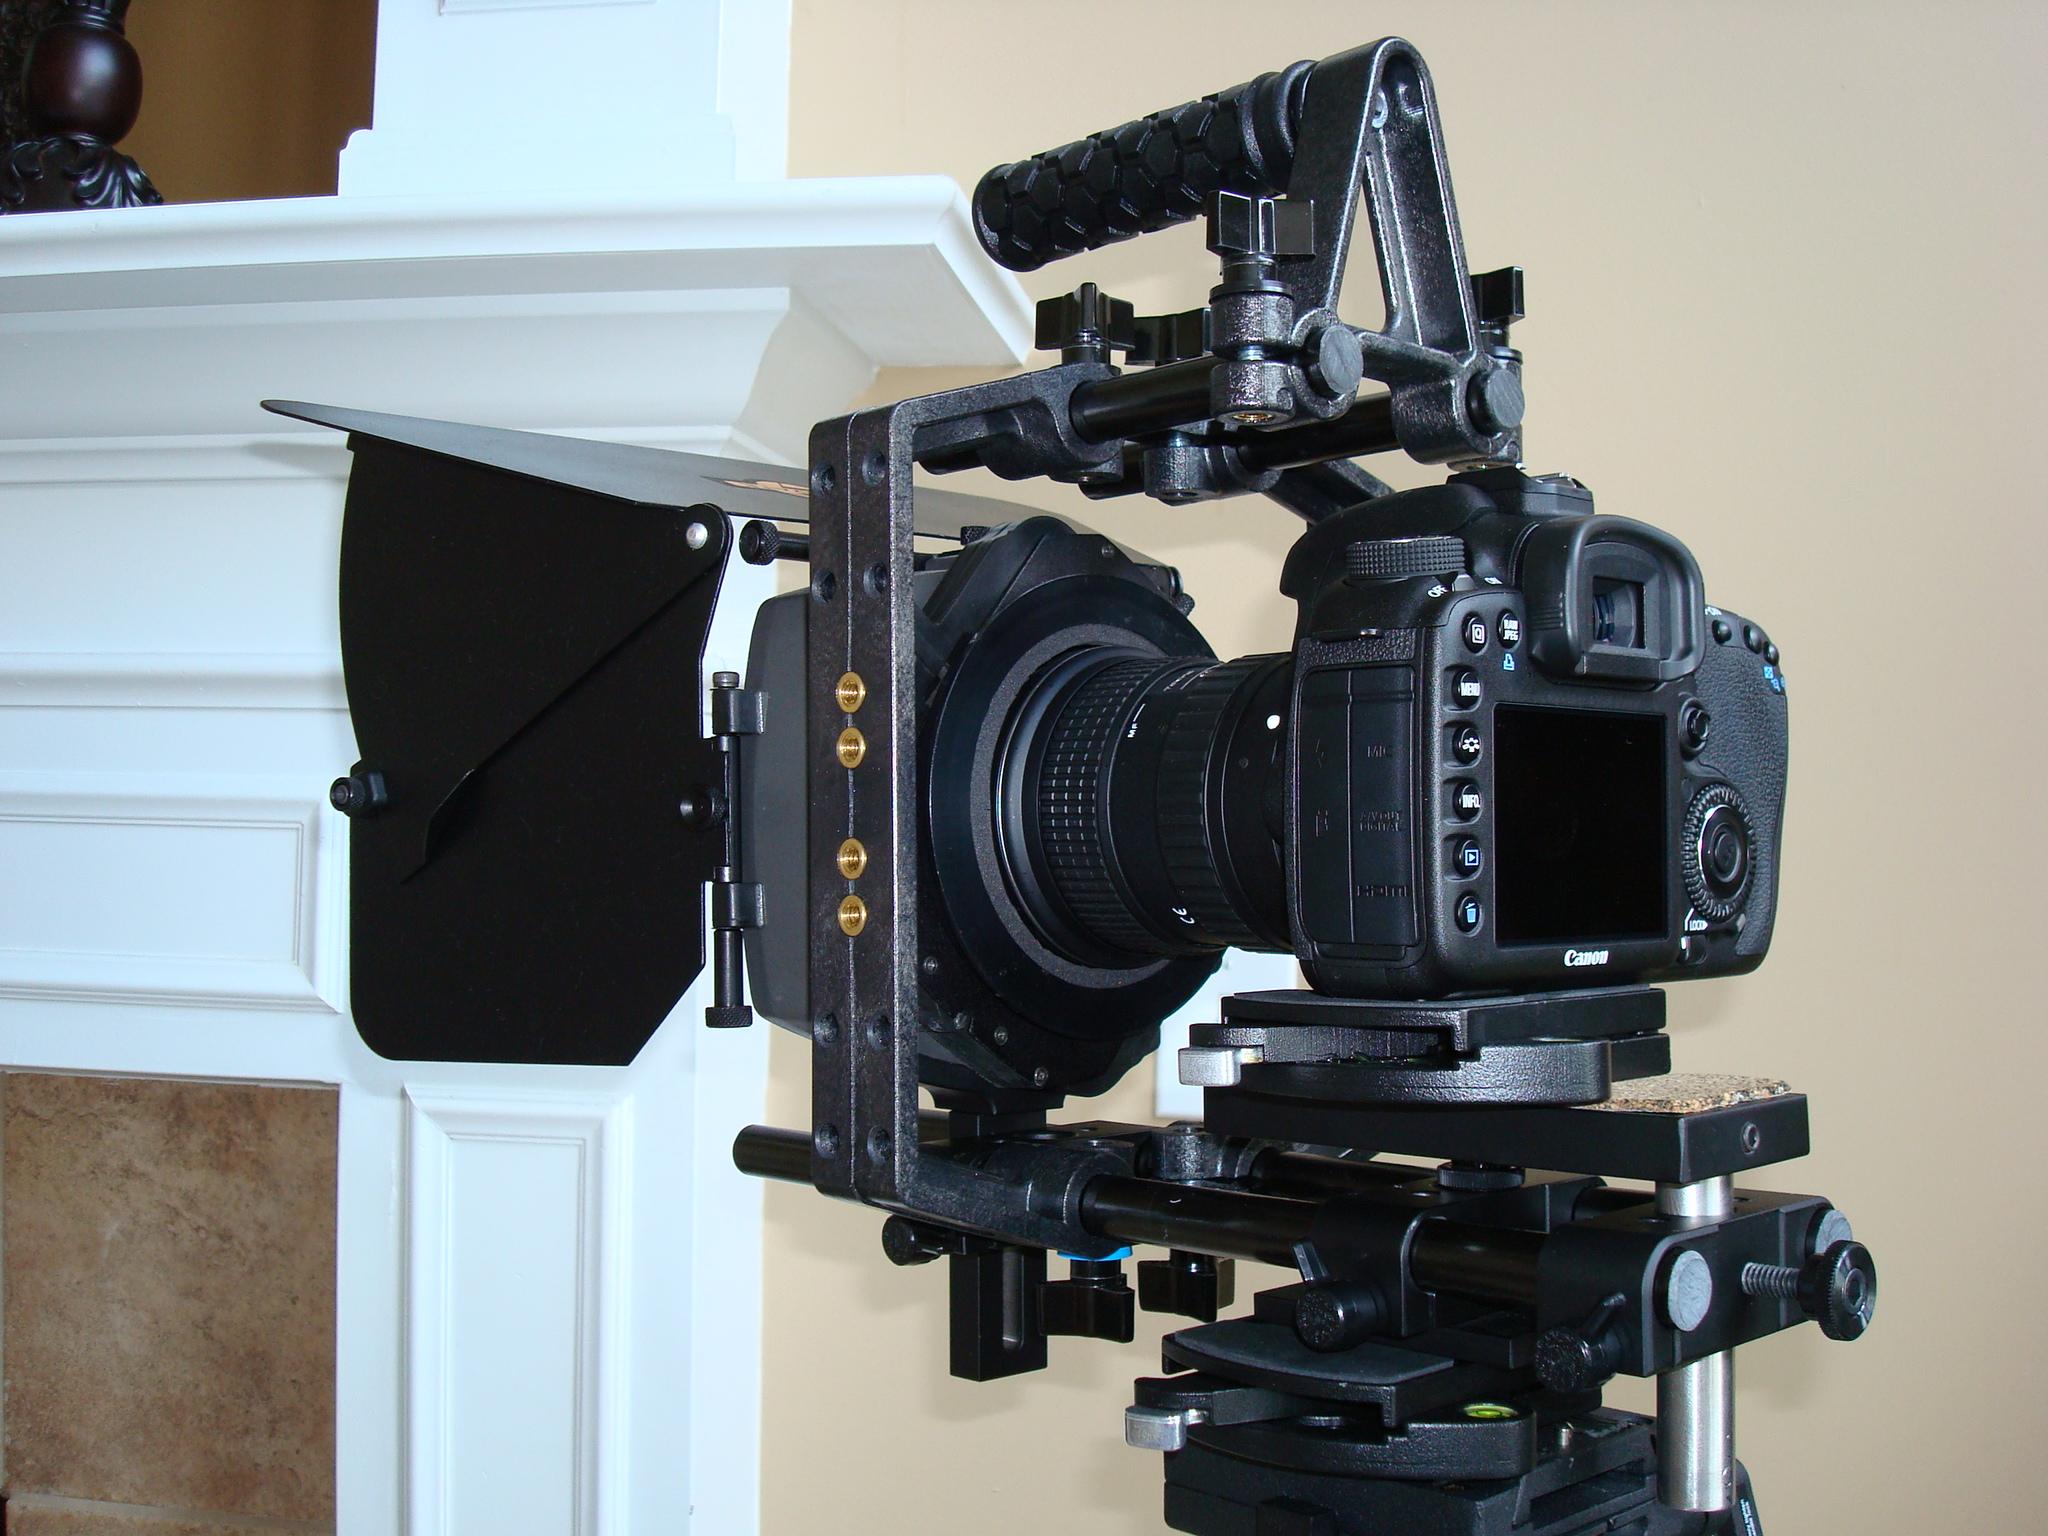 Camera Camera Dslr Rig cinevate dslr rig at dvinfo net dsc01174 jpg